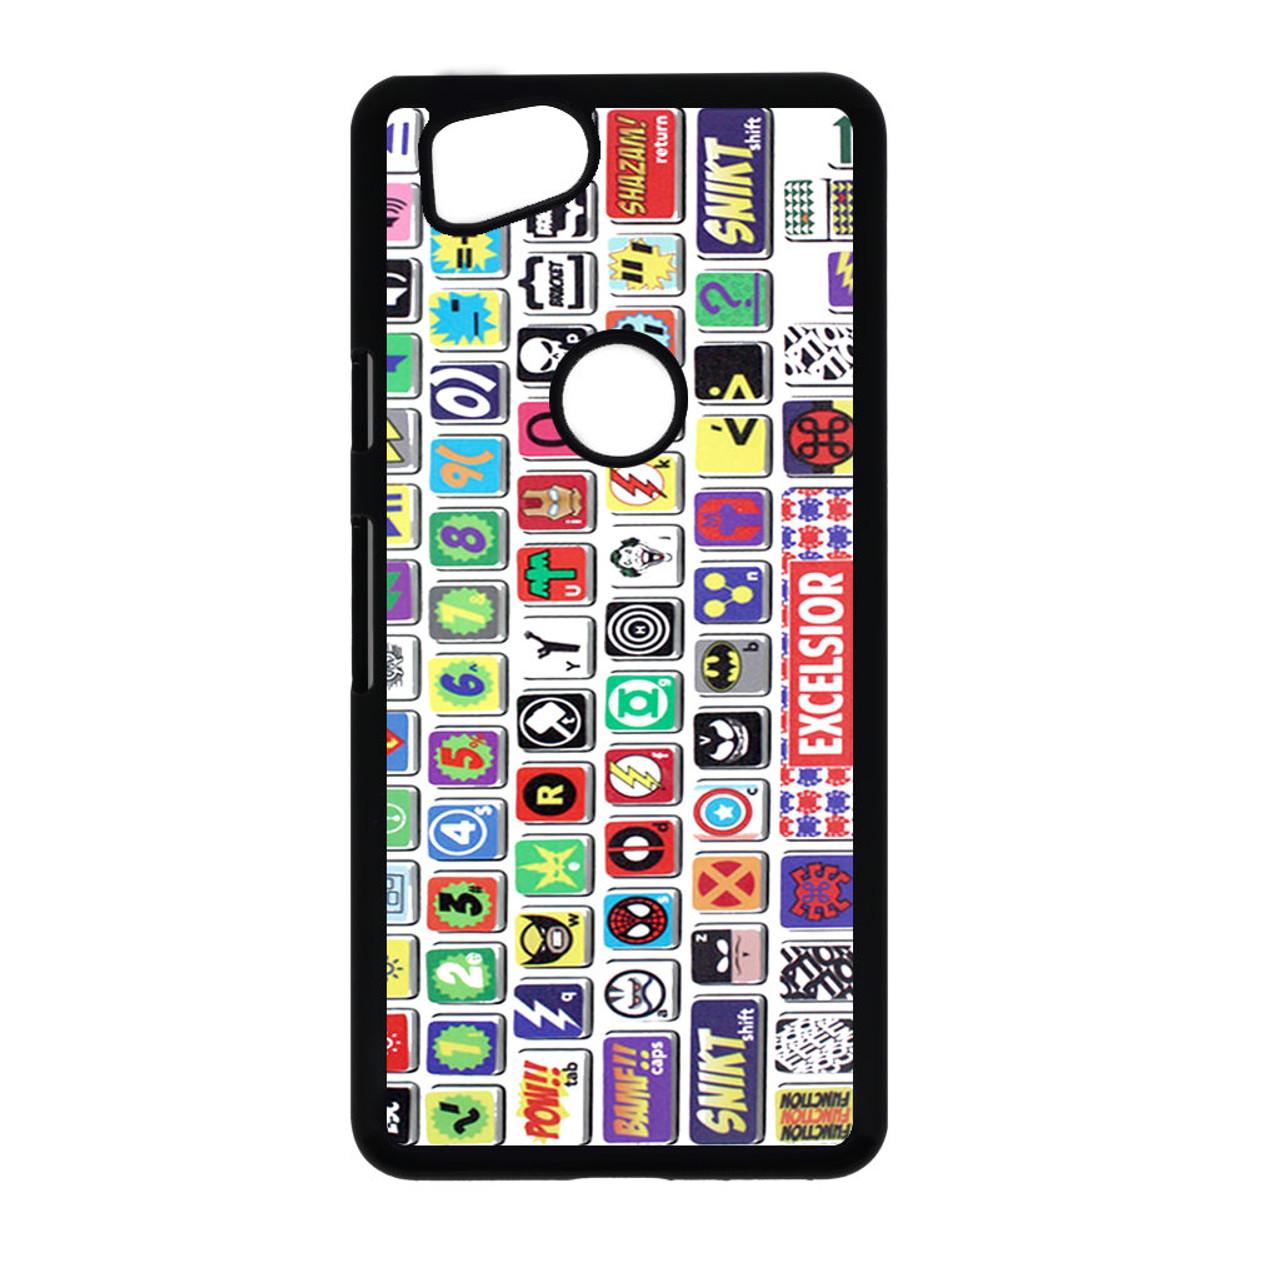 finest selection 45da8 ce4de Macbook Keyboard Super Hero Google Pixel 2 Case